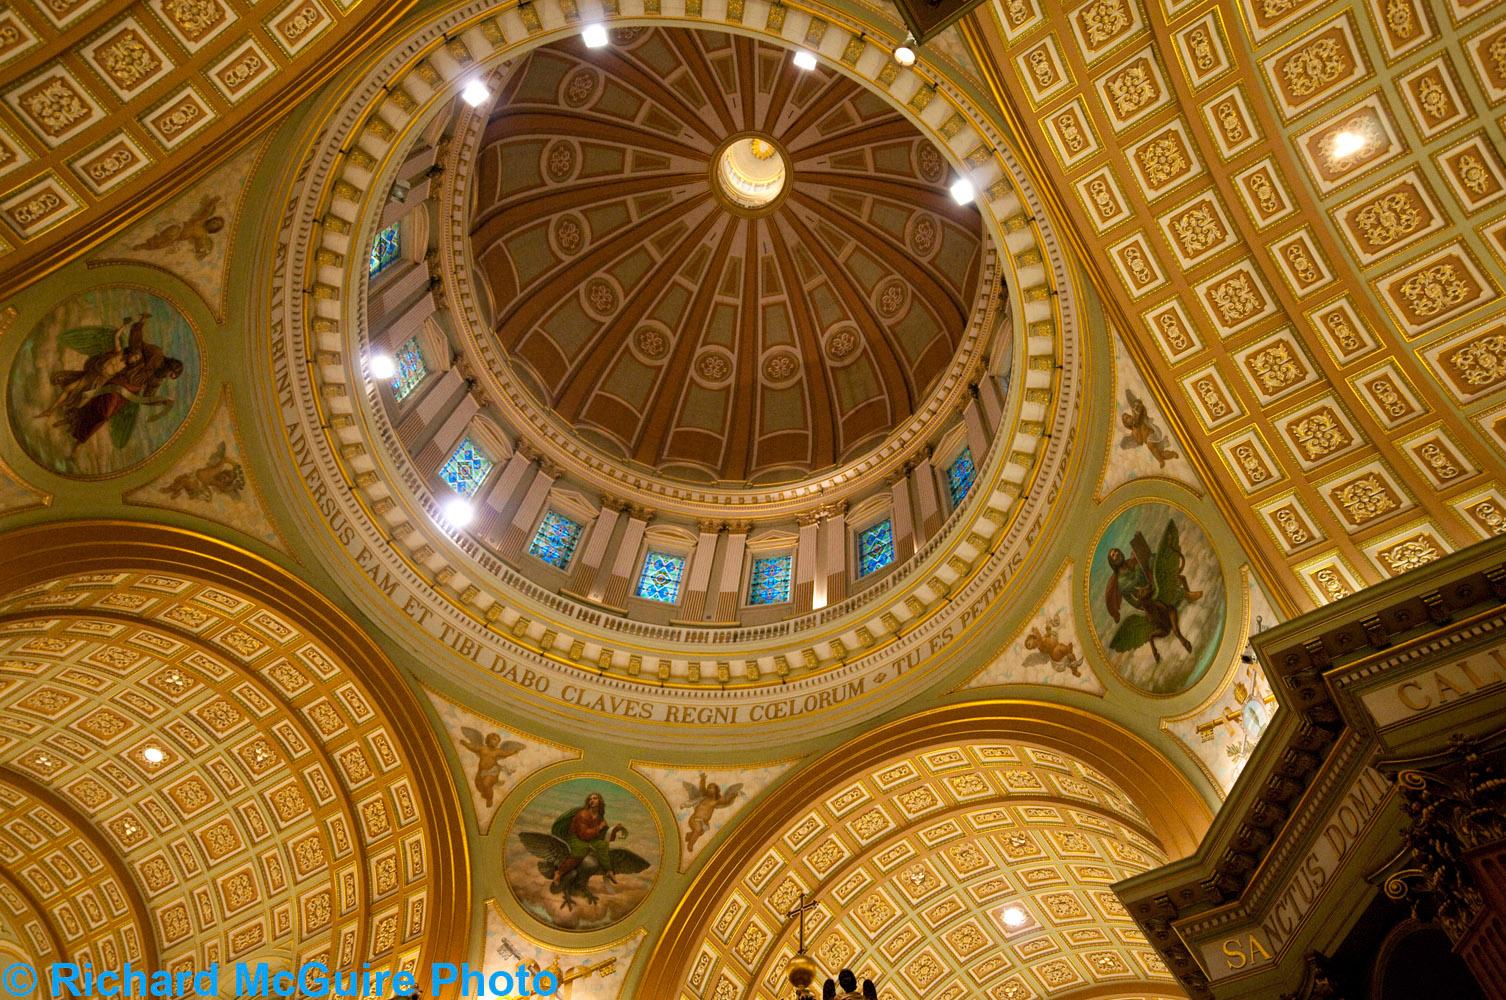 Ceiling, Cathédrale Marie-Reine-du-Monde, Montreal, Quebec